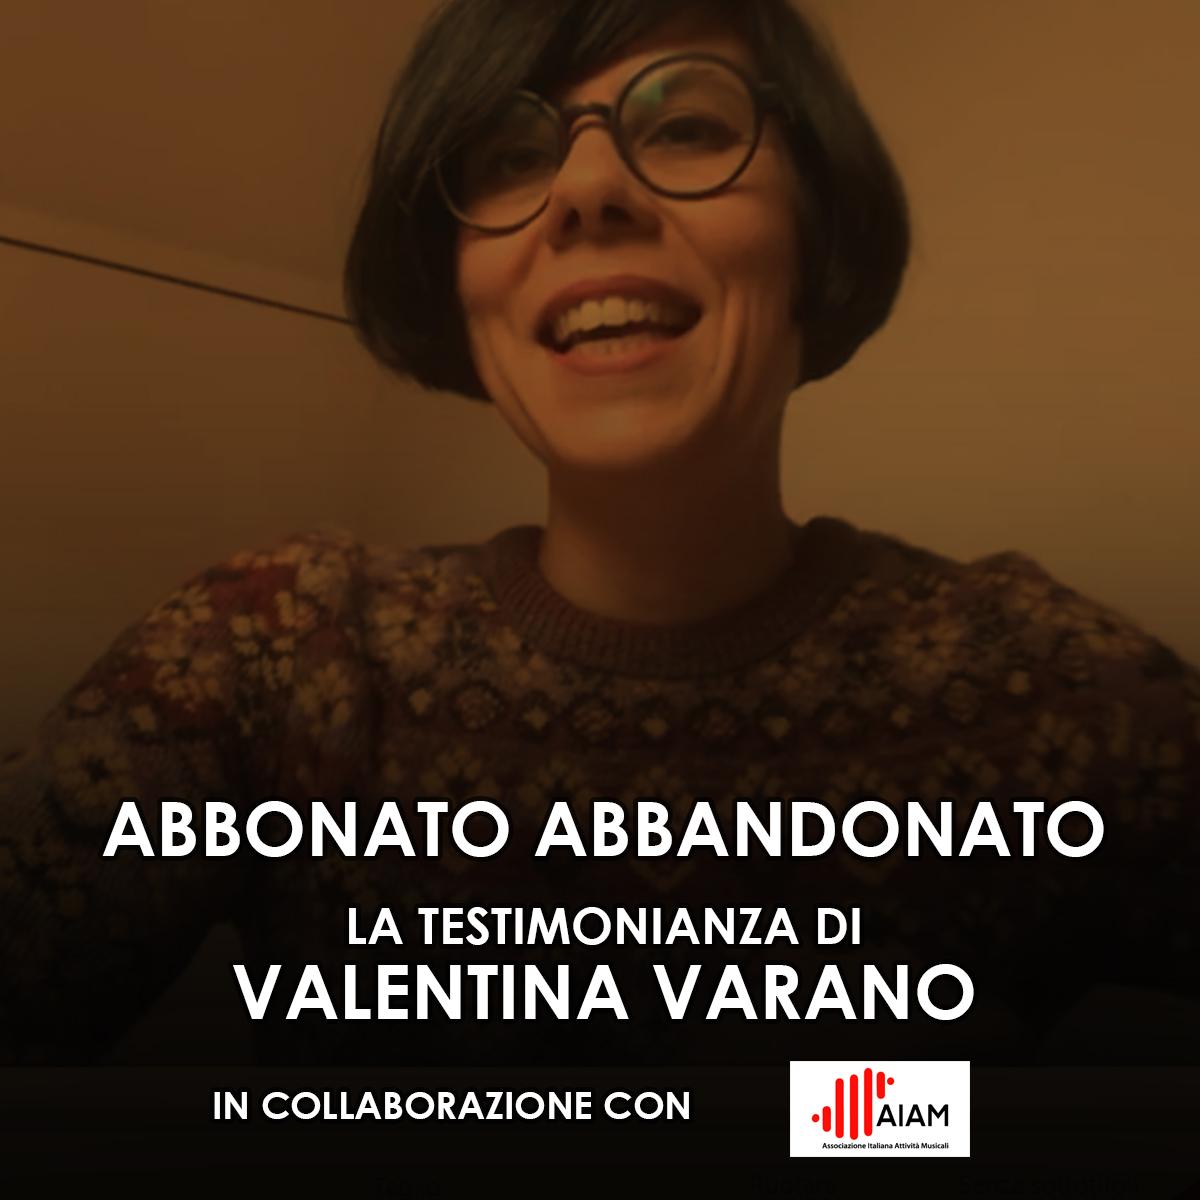 Abbonato Abbandonato: Valentina Varano